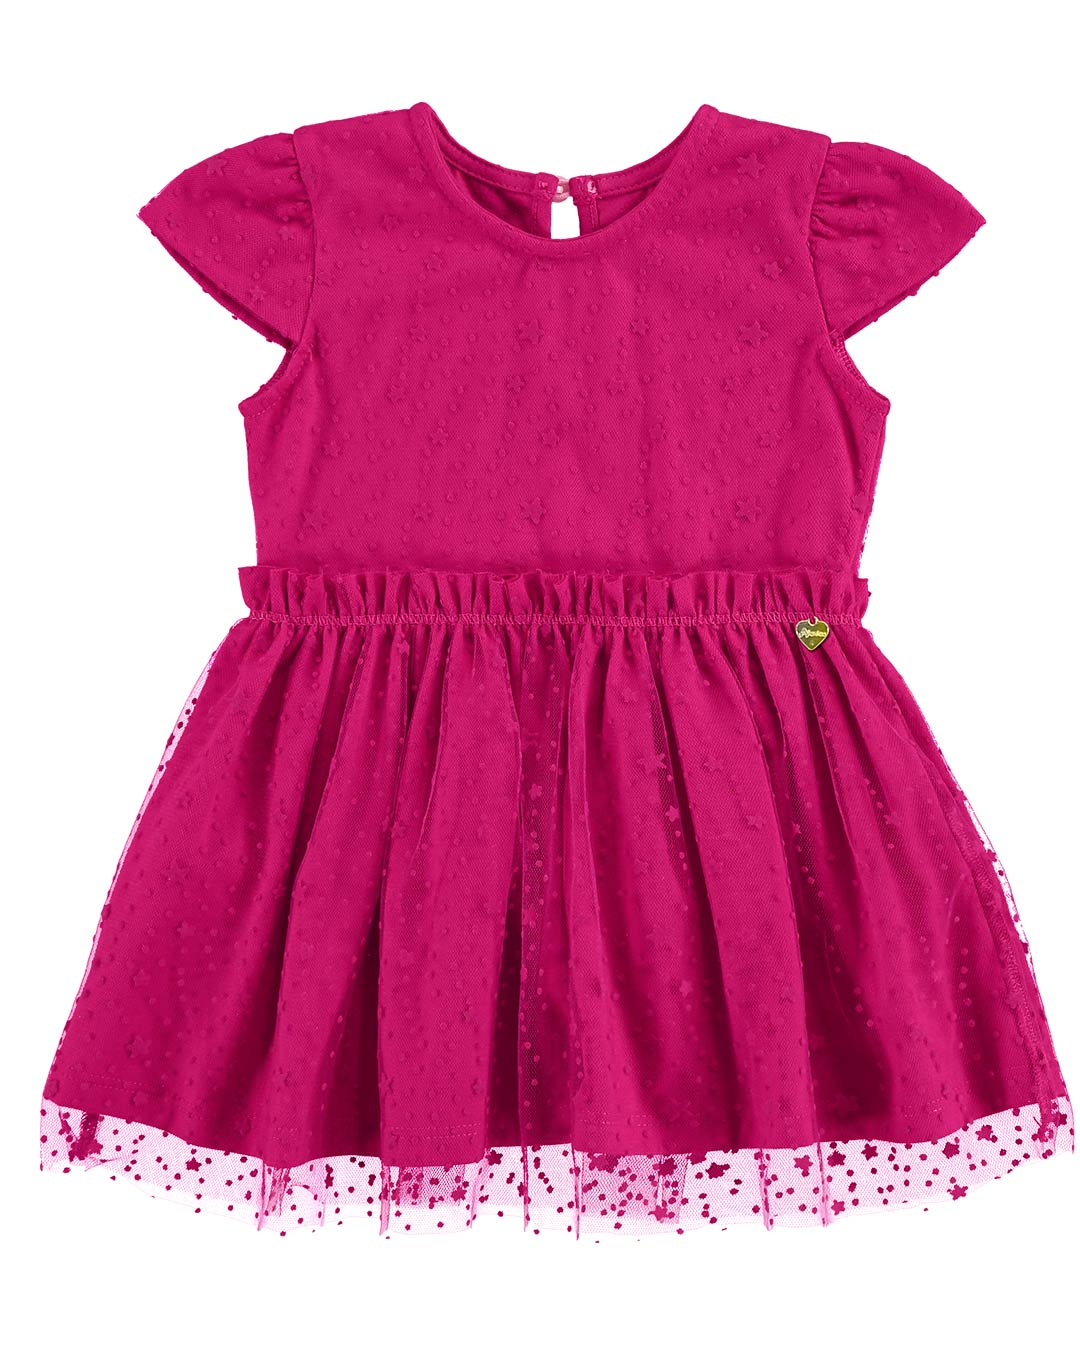 Vestido Bebê Renda e Tule - Alenice